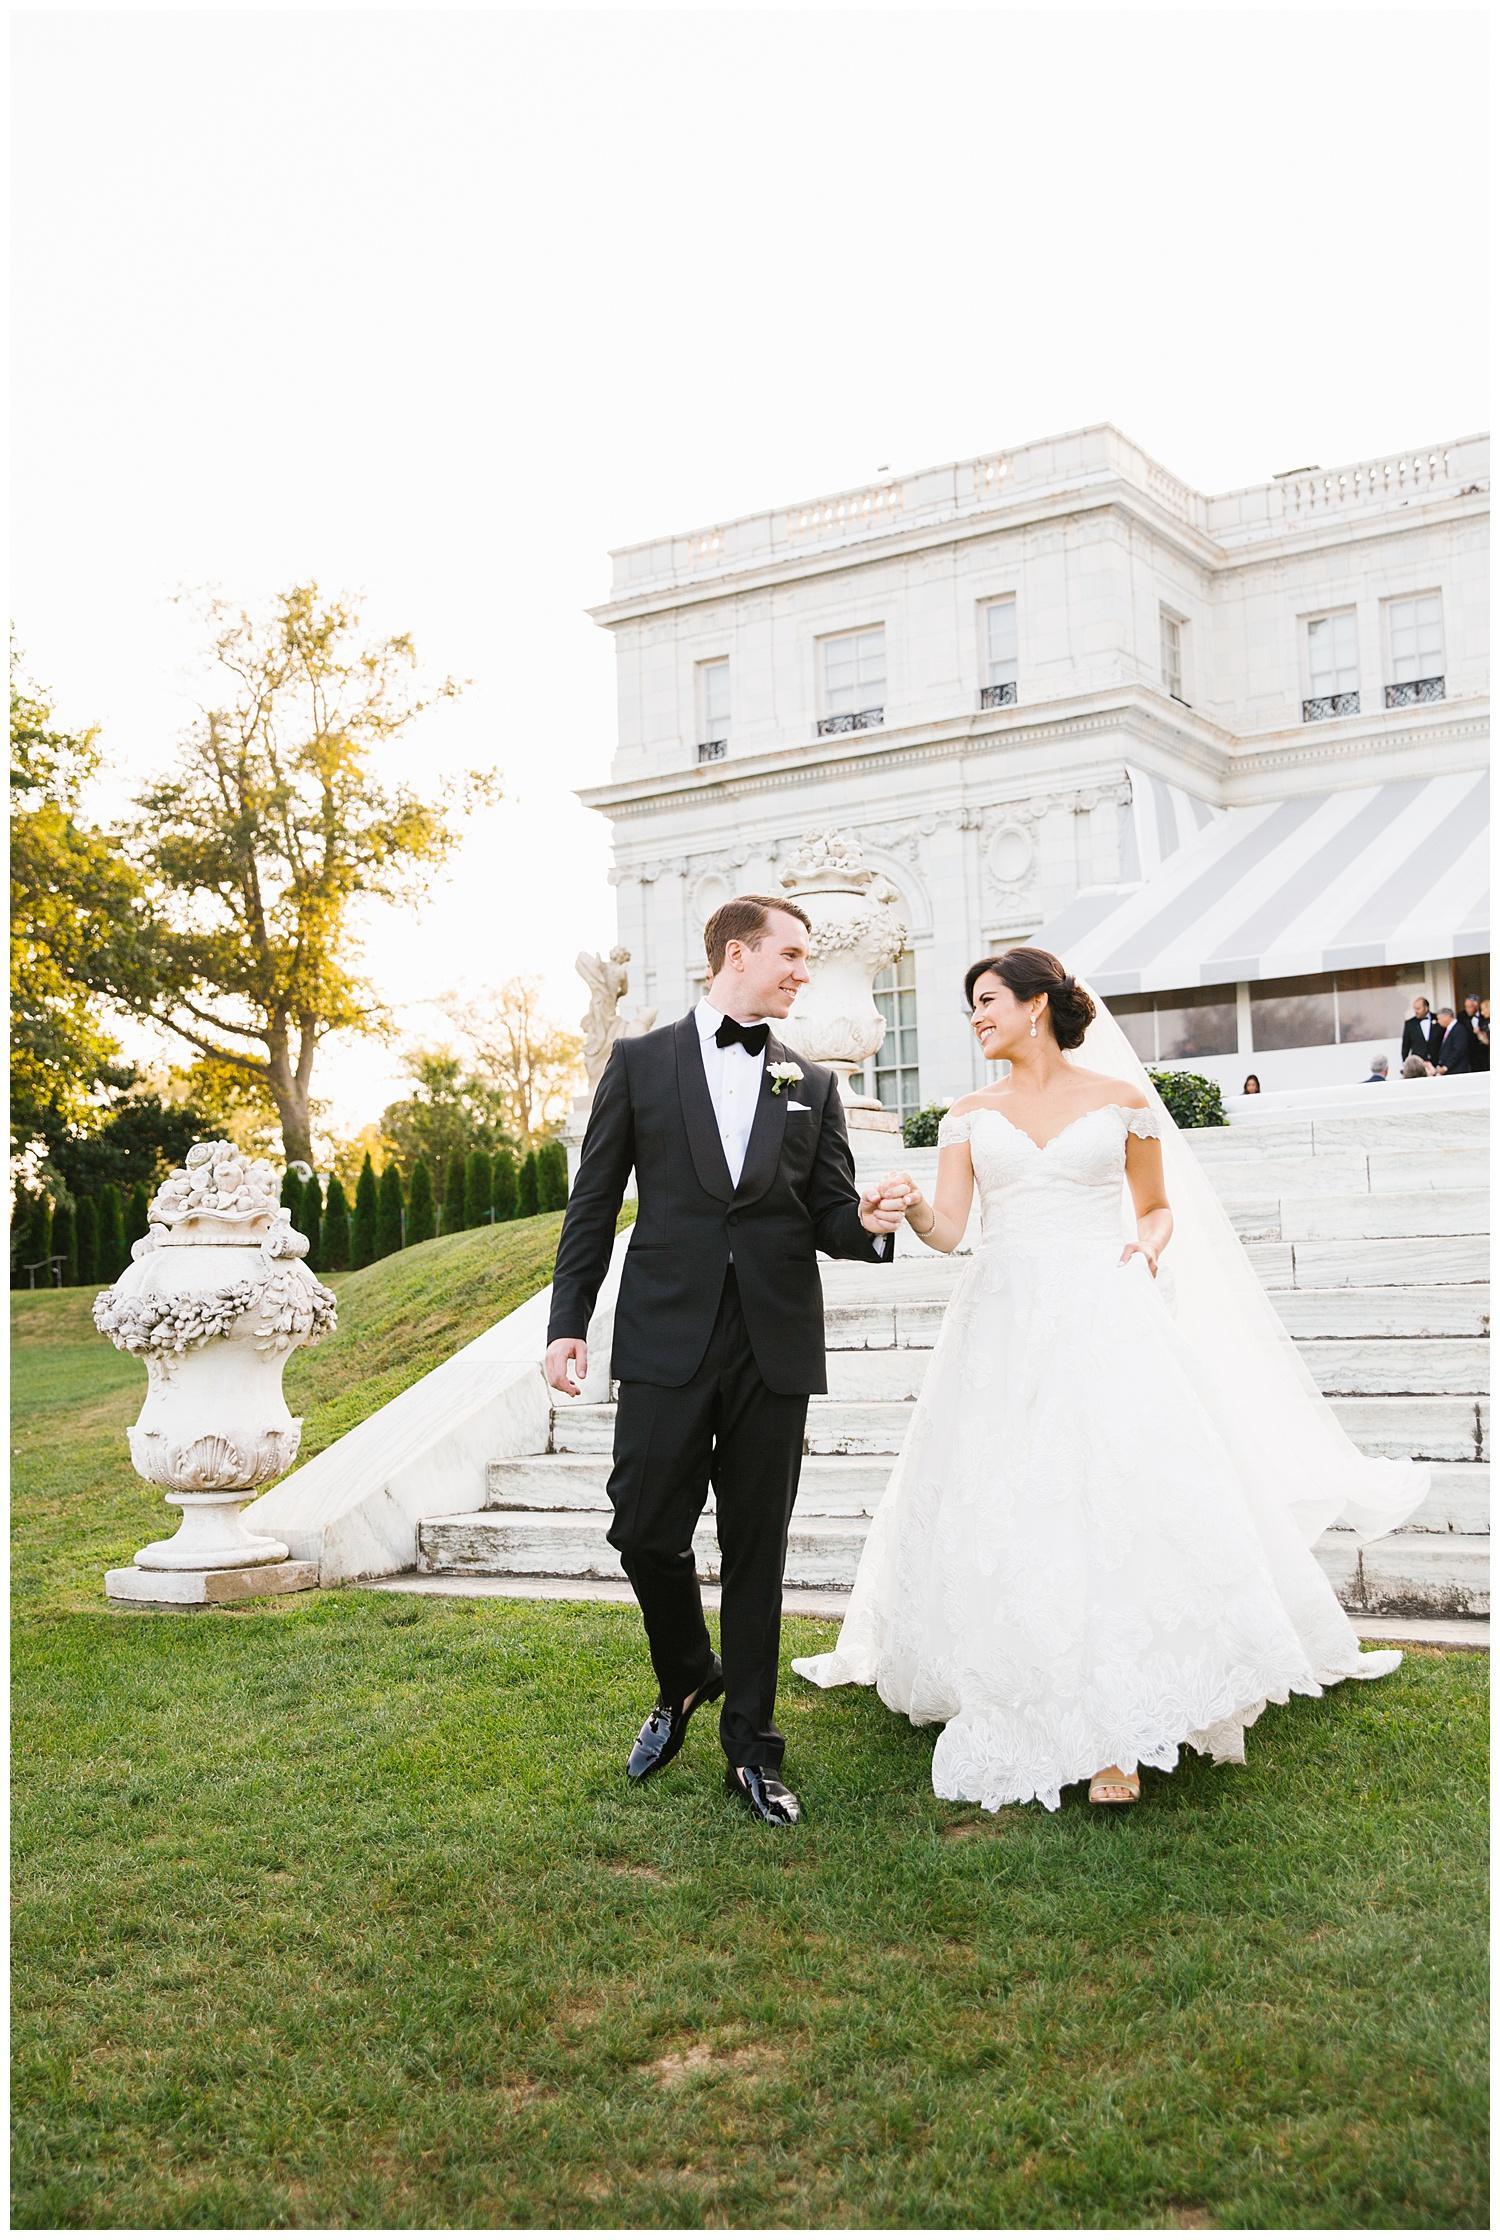 Stephen_Nathalie_Rosecliff_Mansion_Wedding_021.jpeg